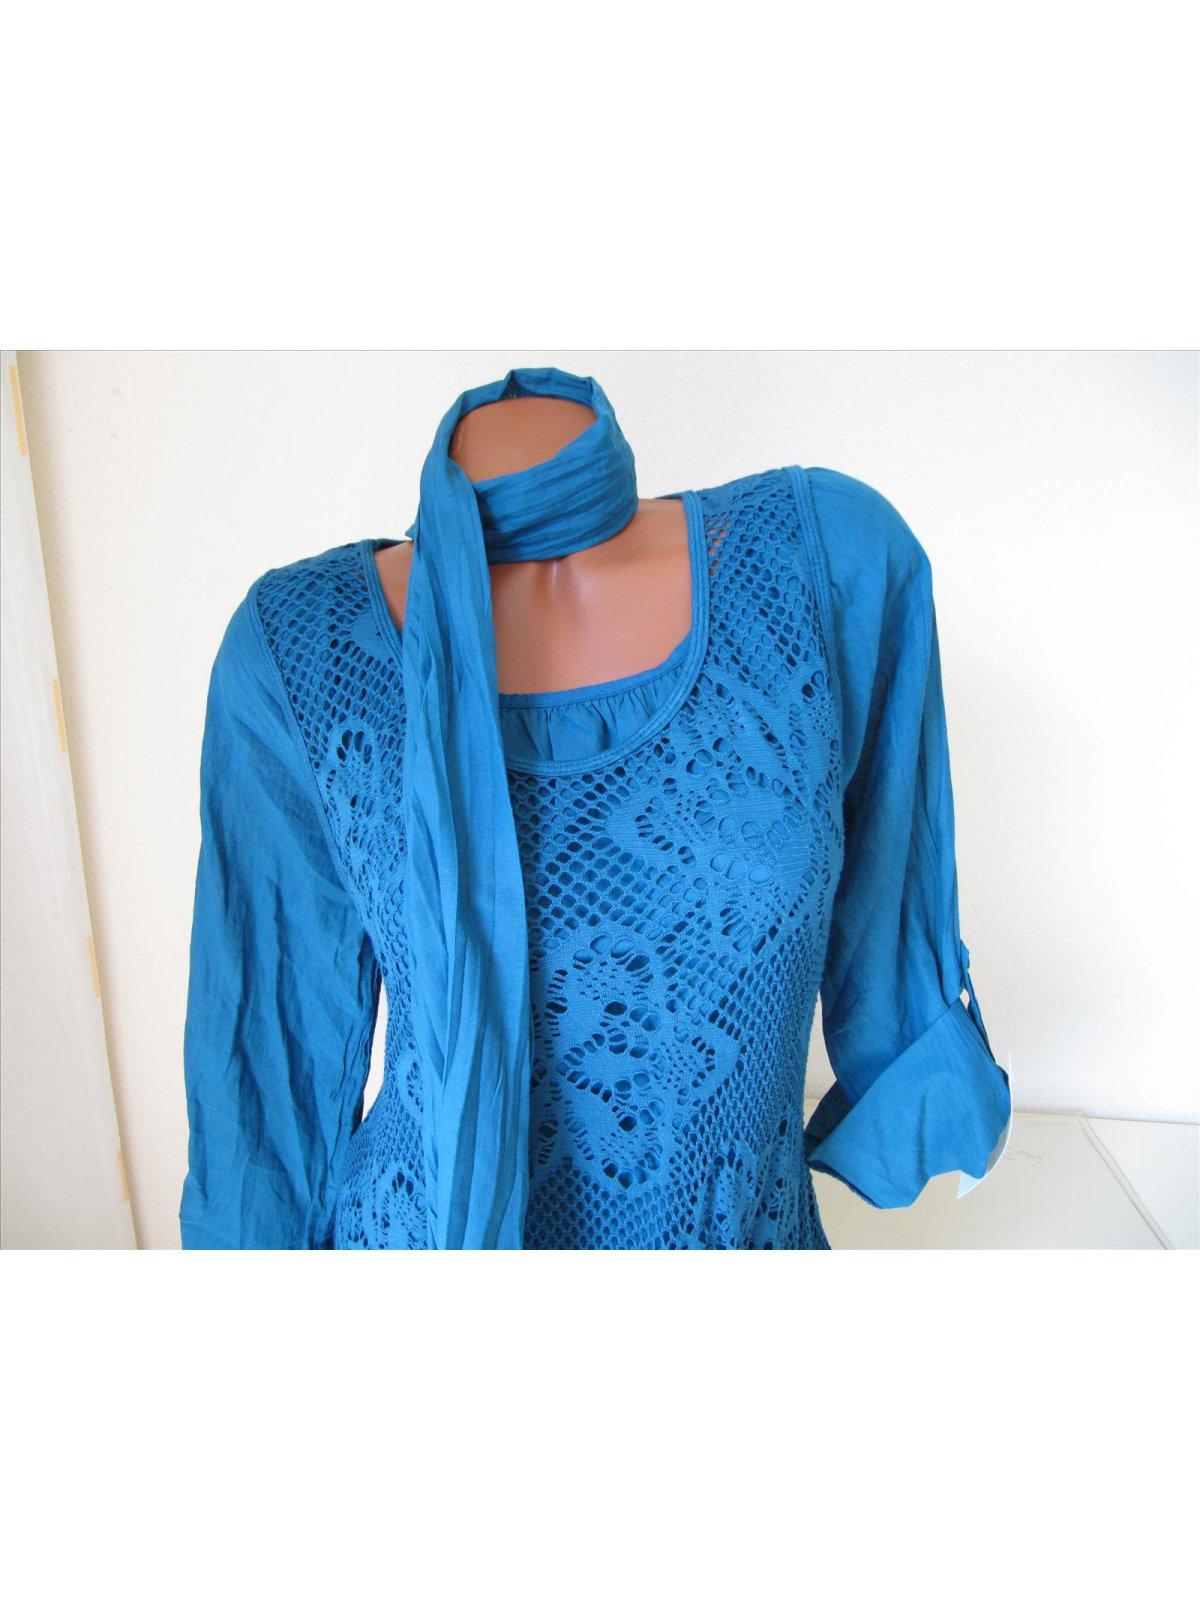 zipfel tunika kleid spitze volant unterkleid bluse schal petrol blau. Black Bedroom Furniture Sets. Home Design Ideas